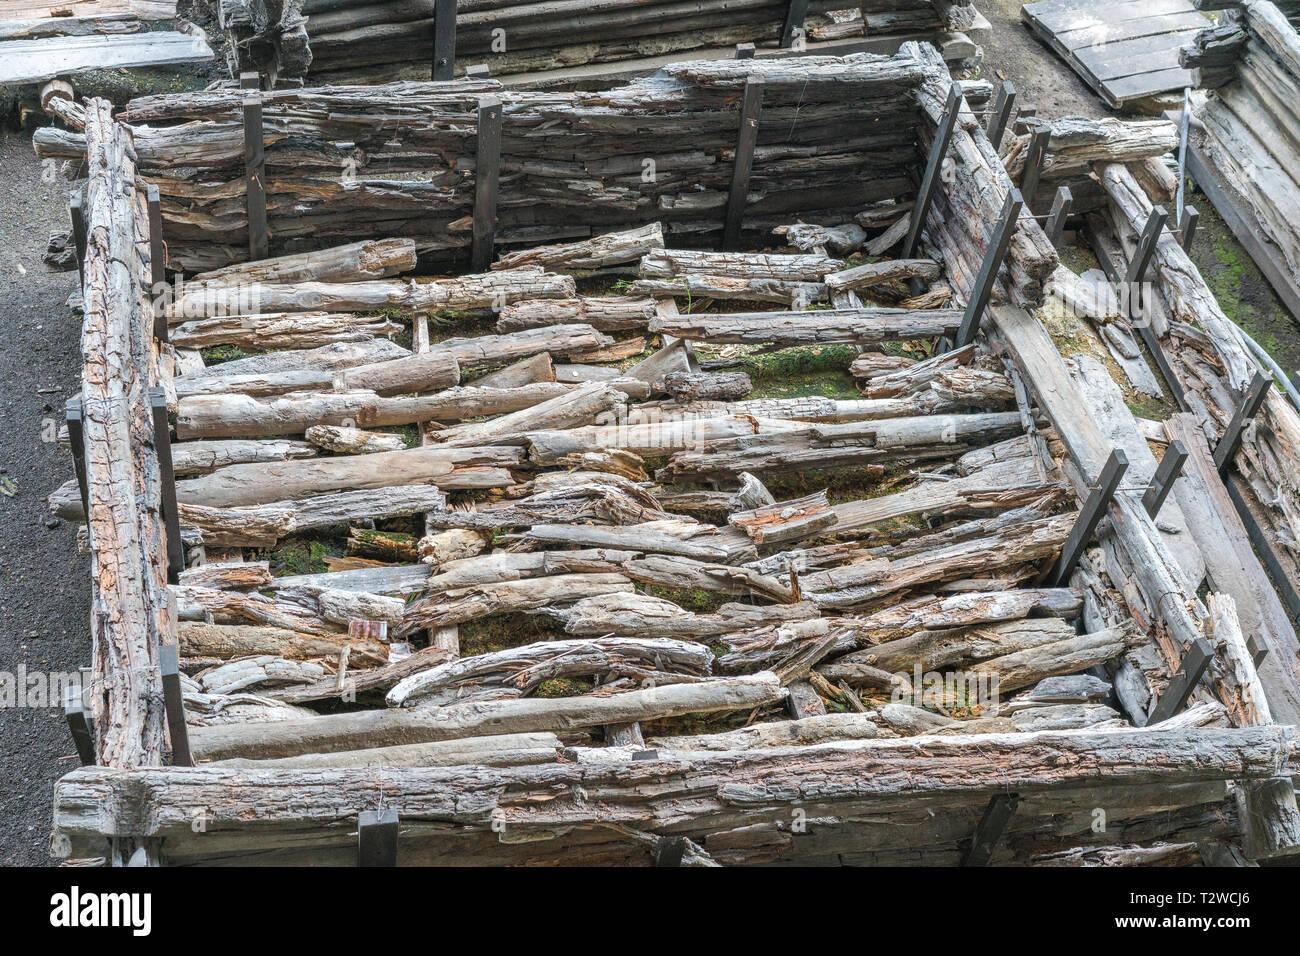 Brest, Belarus - July 28, 2018: Berestye Archeological Museum - East Slavic wooden town from 13th century. - Stock Image